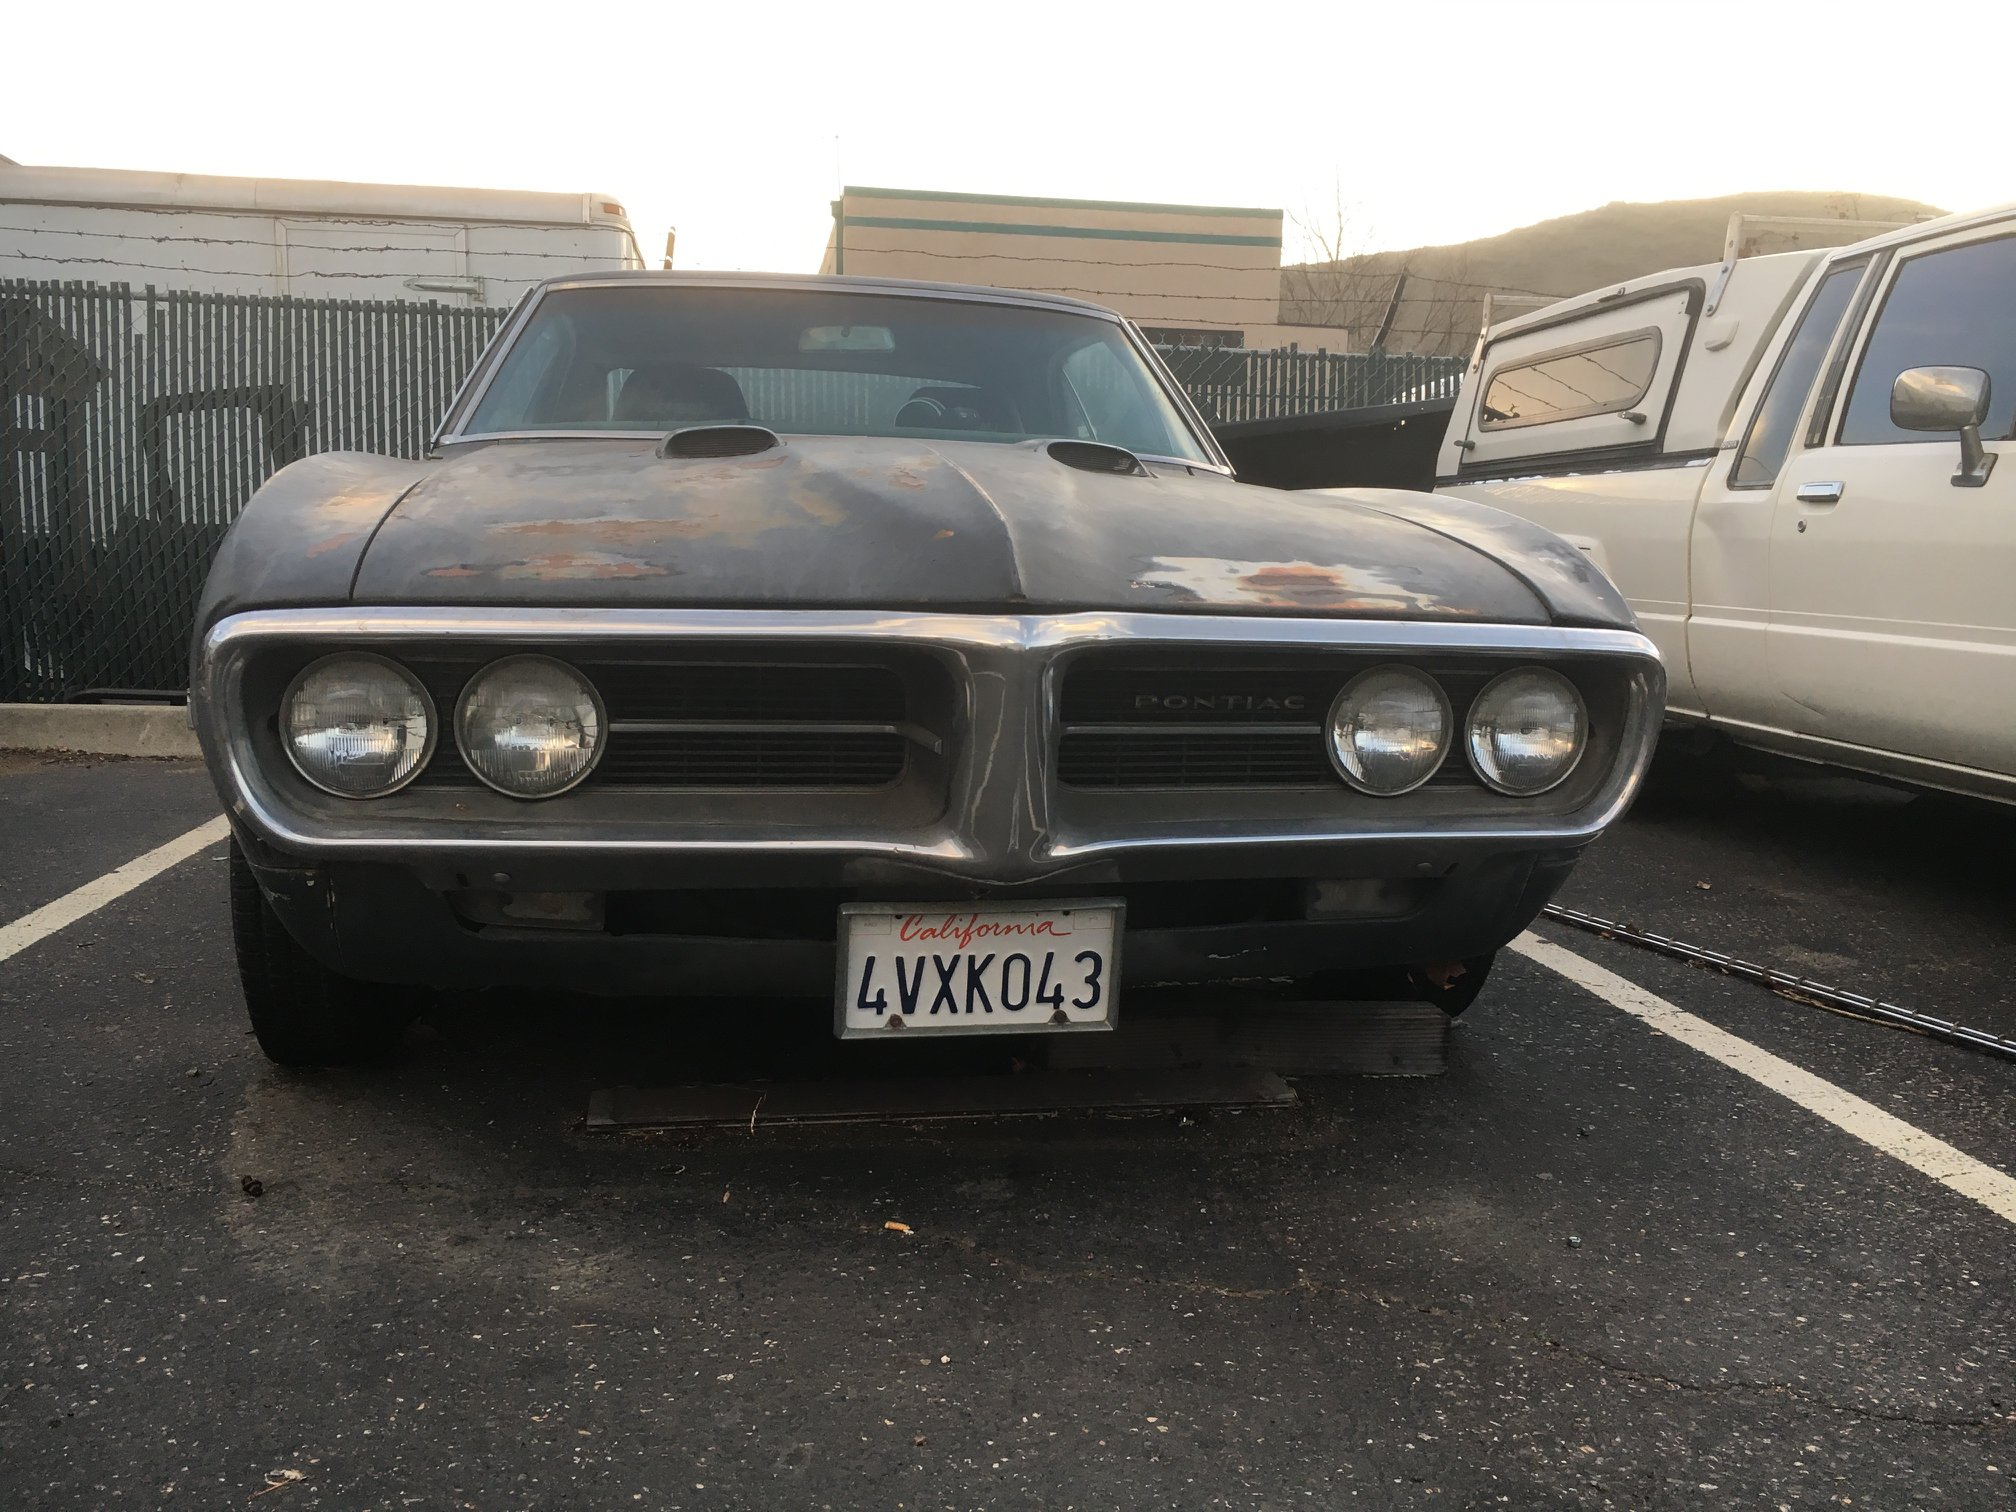 1967-Pontiac-Firebird--American-classics-muscle-car-Dave-Rabin-1